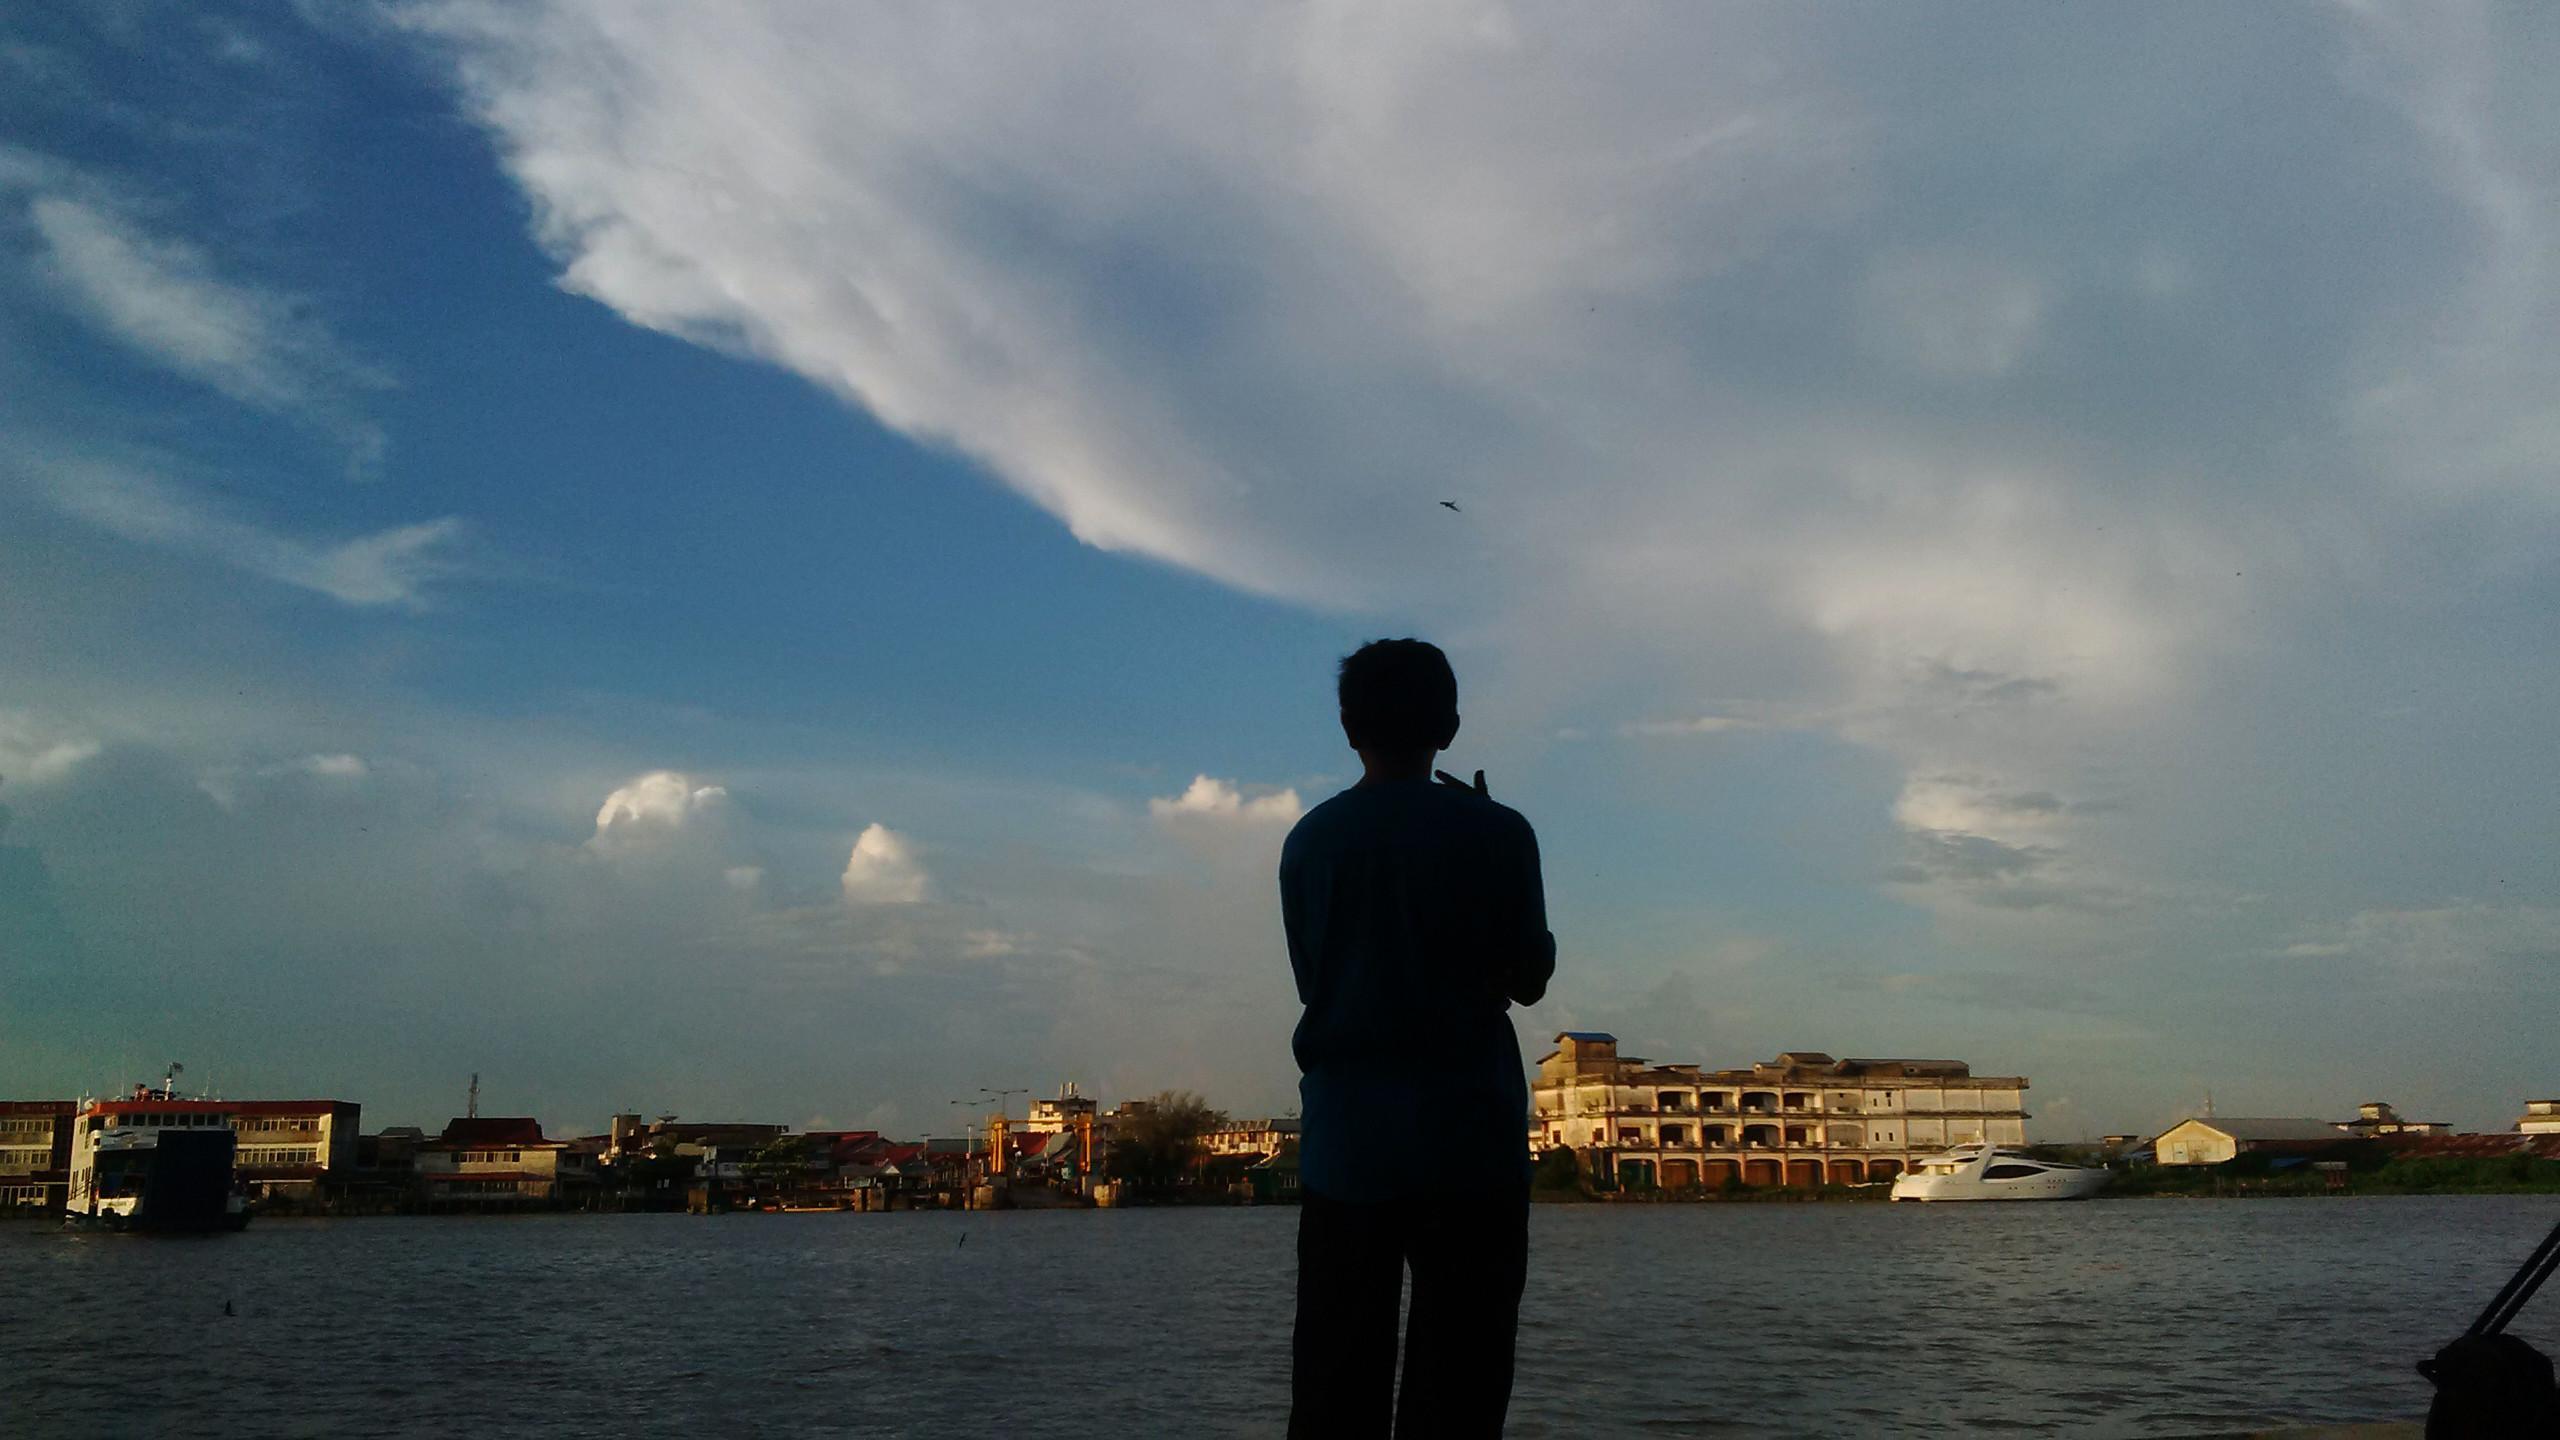 Suasana dan aktivitas pagi di pinggiran Sungai Kapuas, Pontianak, Kalimantan Barat. (Liputan6.com/Raden AMP)